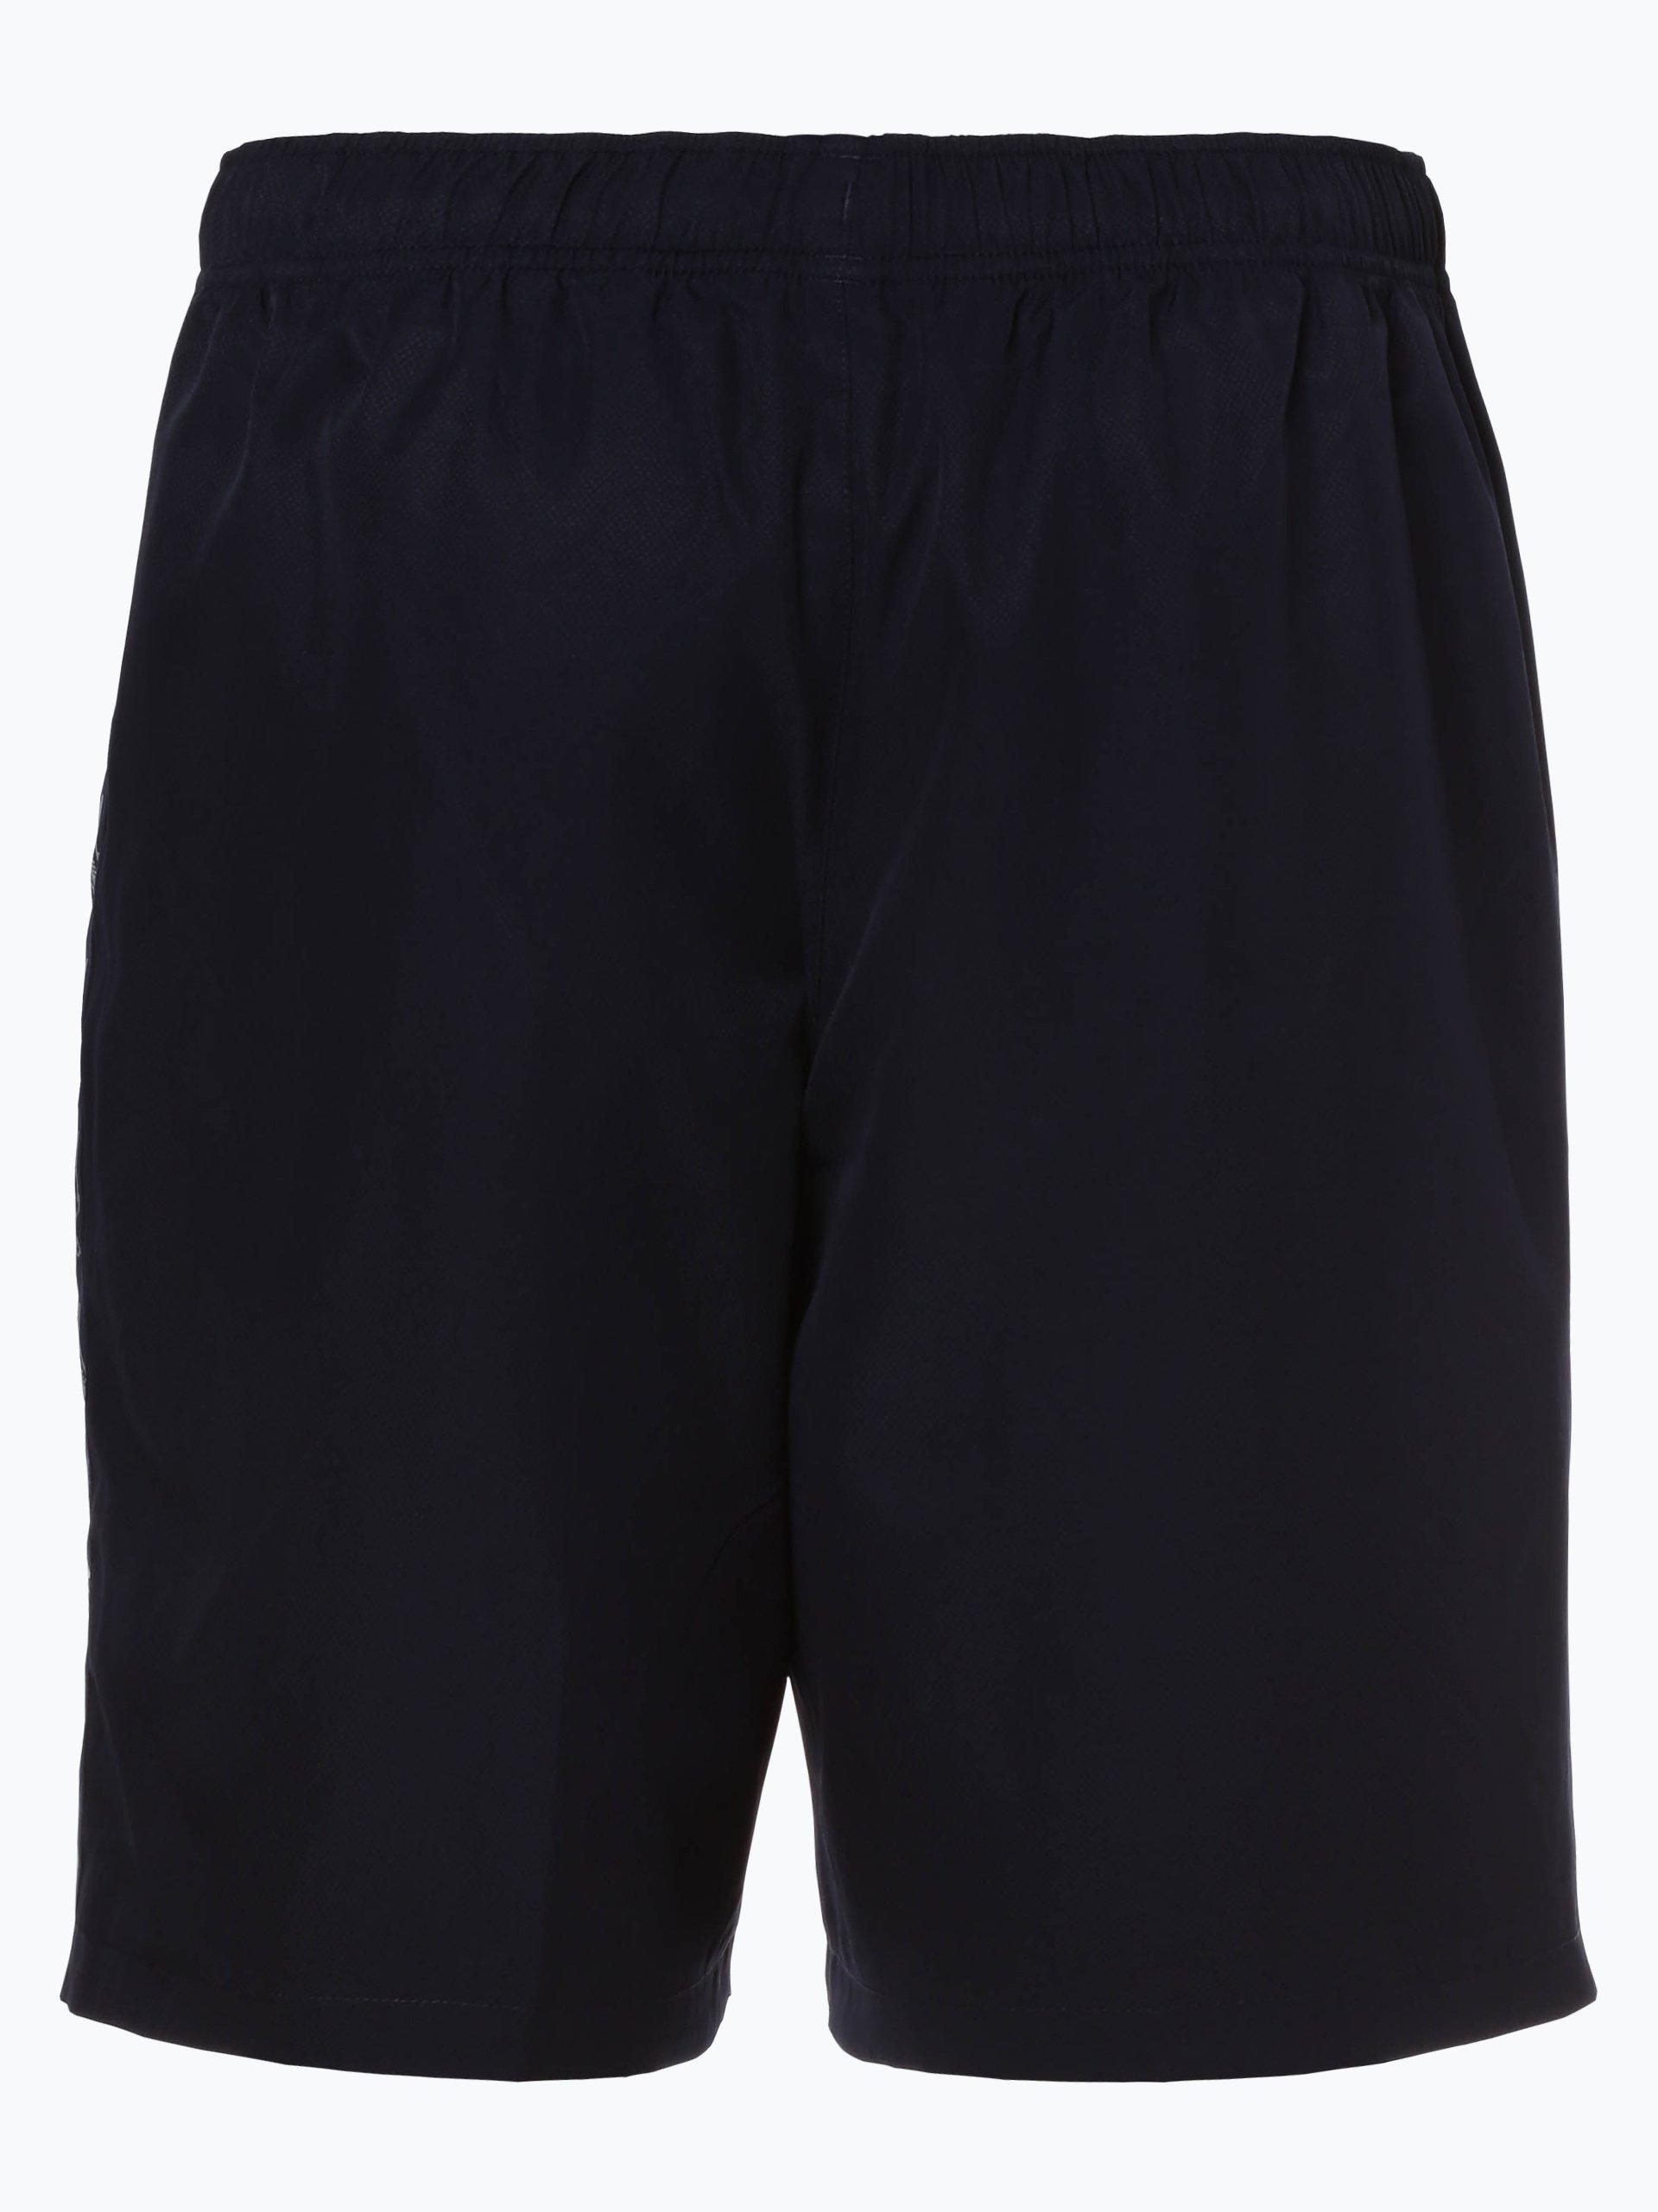 Lacoste Herren Shorts